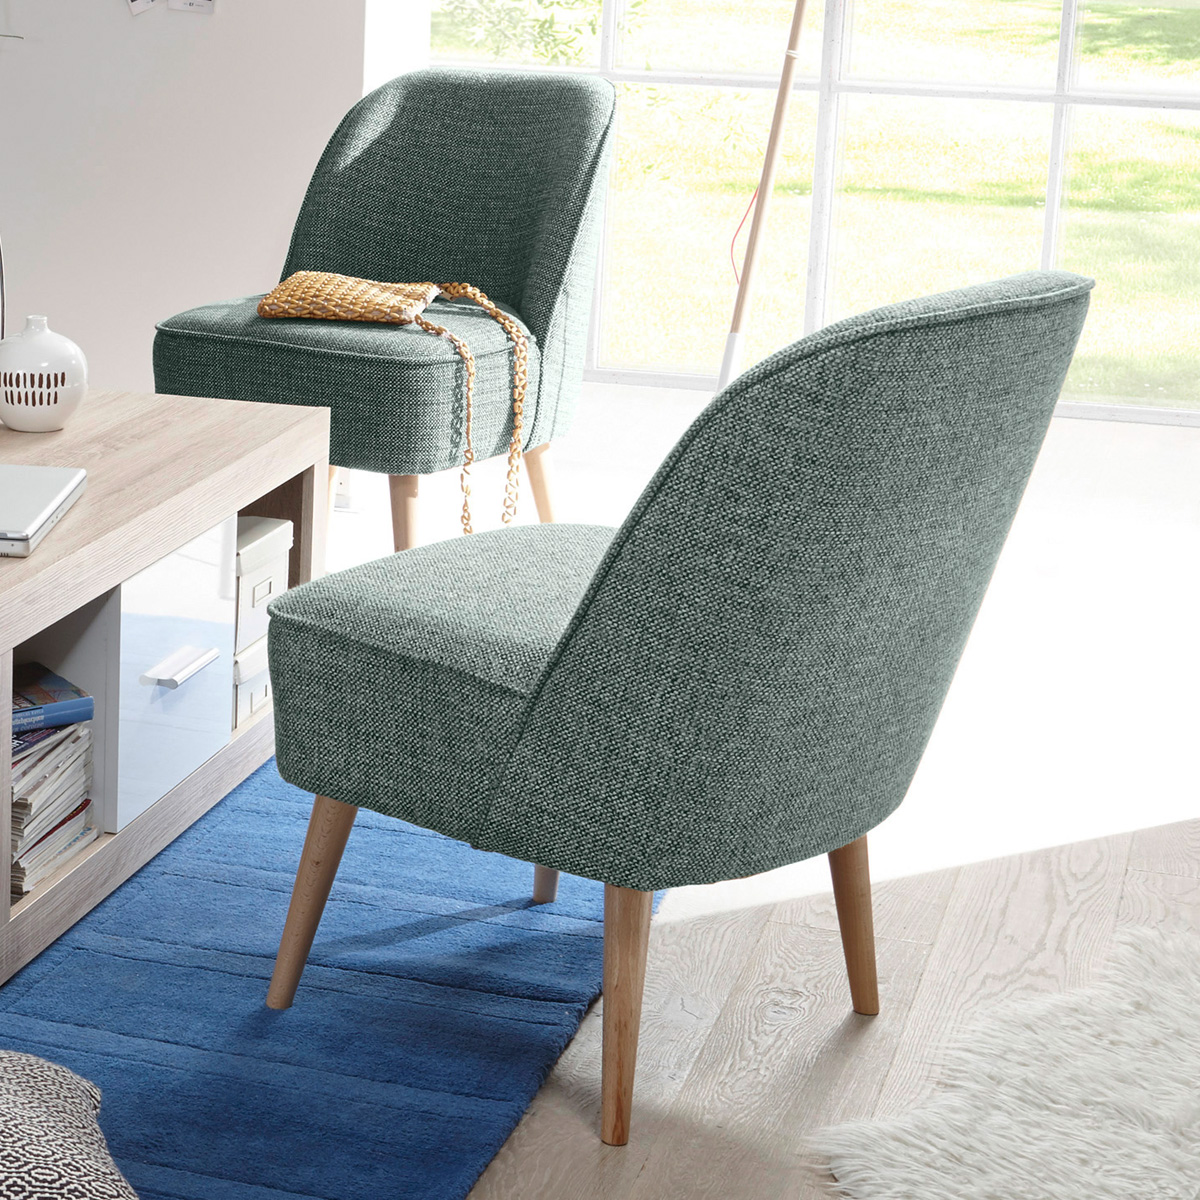 polsterstuhl pino esszimmerstuhl sessel in stoff gr n mit nosagfederung 54 cm 4250826357864 ebay. Black Bedroom Furniture Sets. Home Design Ideas